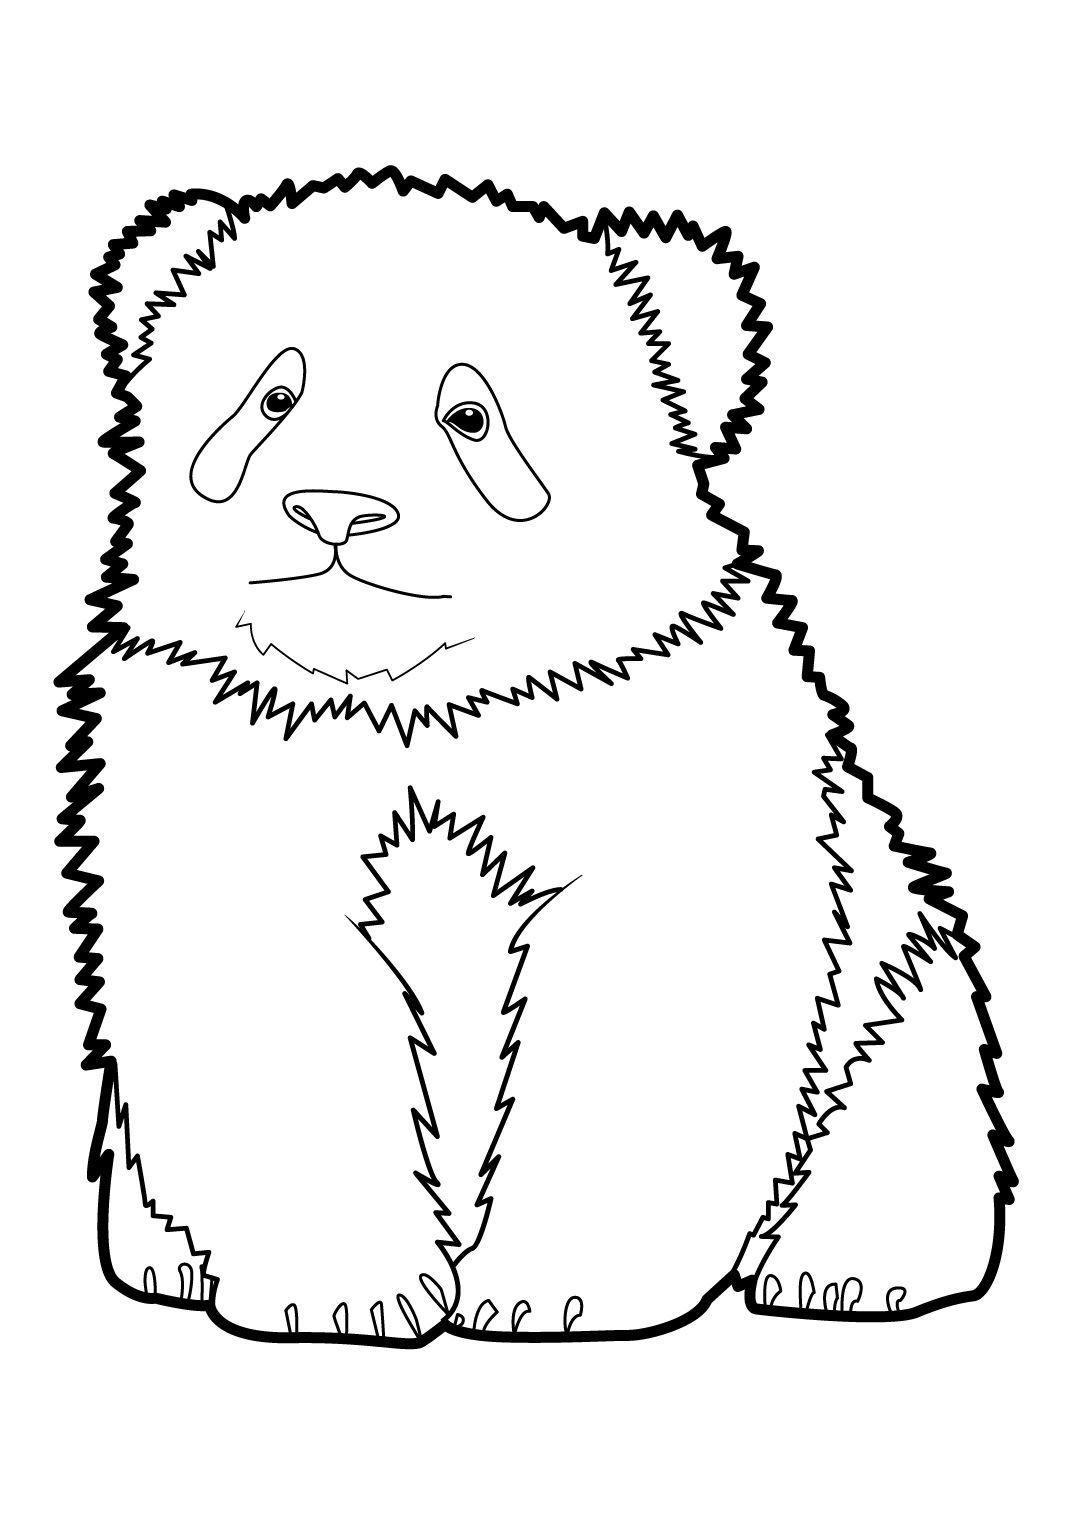 Coloriage Panda 10 - Coloriage Pandas - Coloriages Animaux